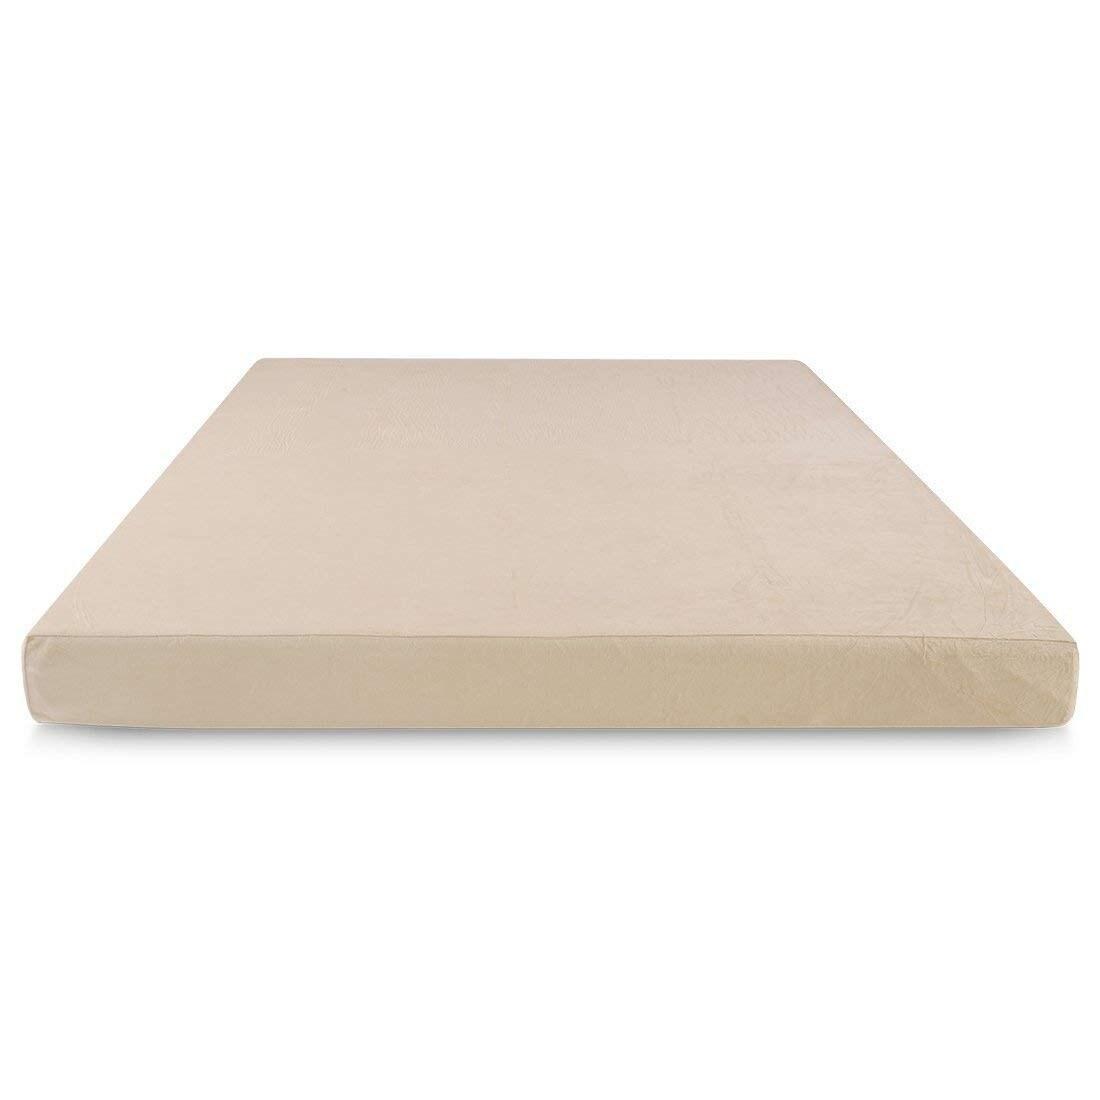 cr sleep beige 5 inch full size memory foam mattress free shipping